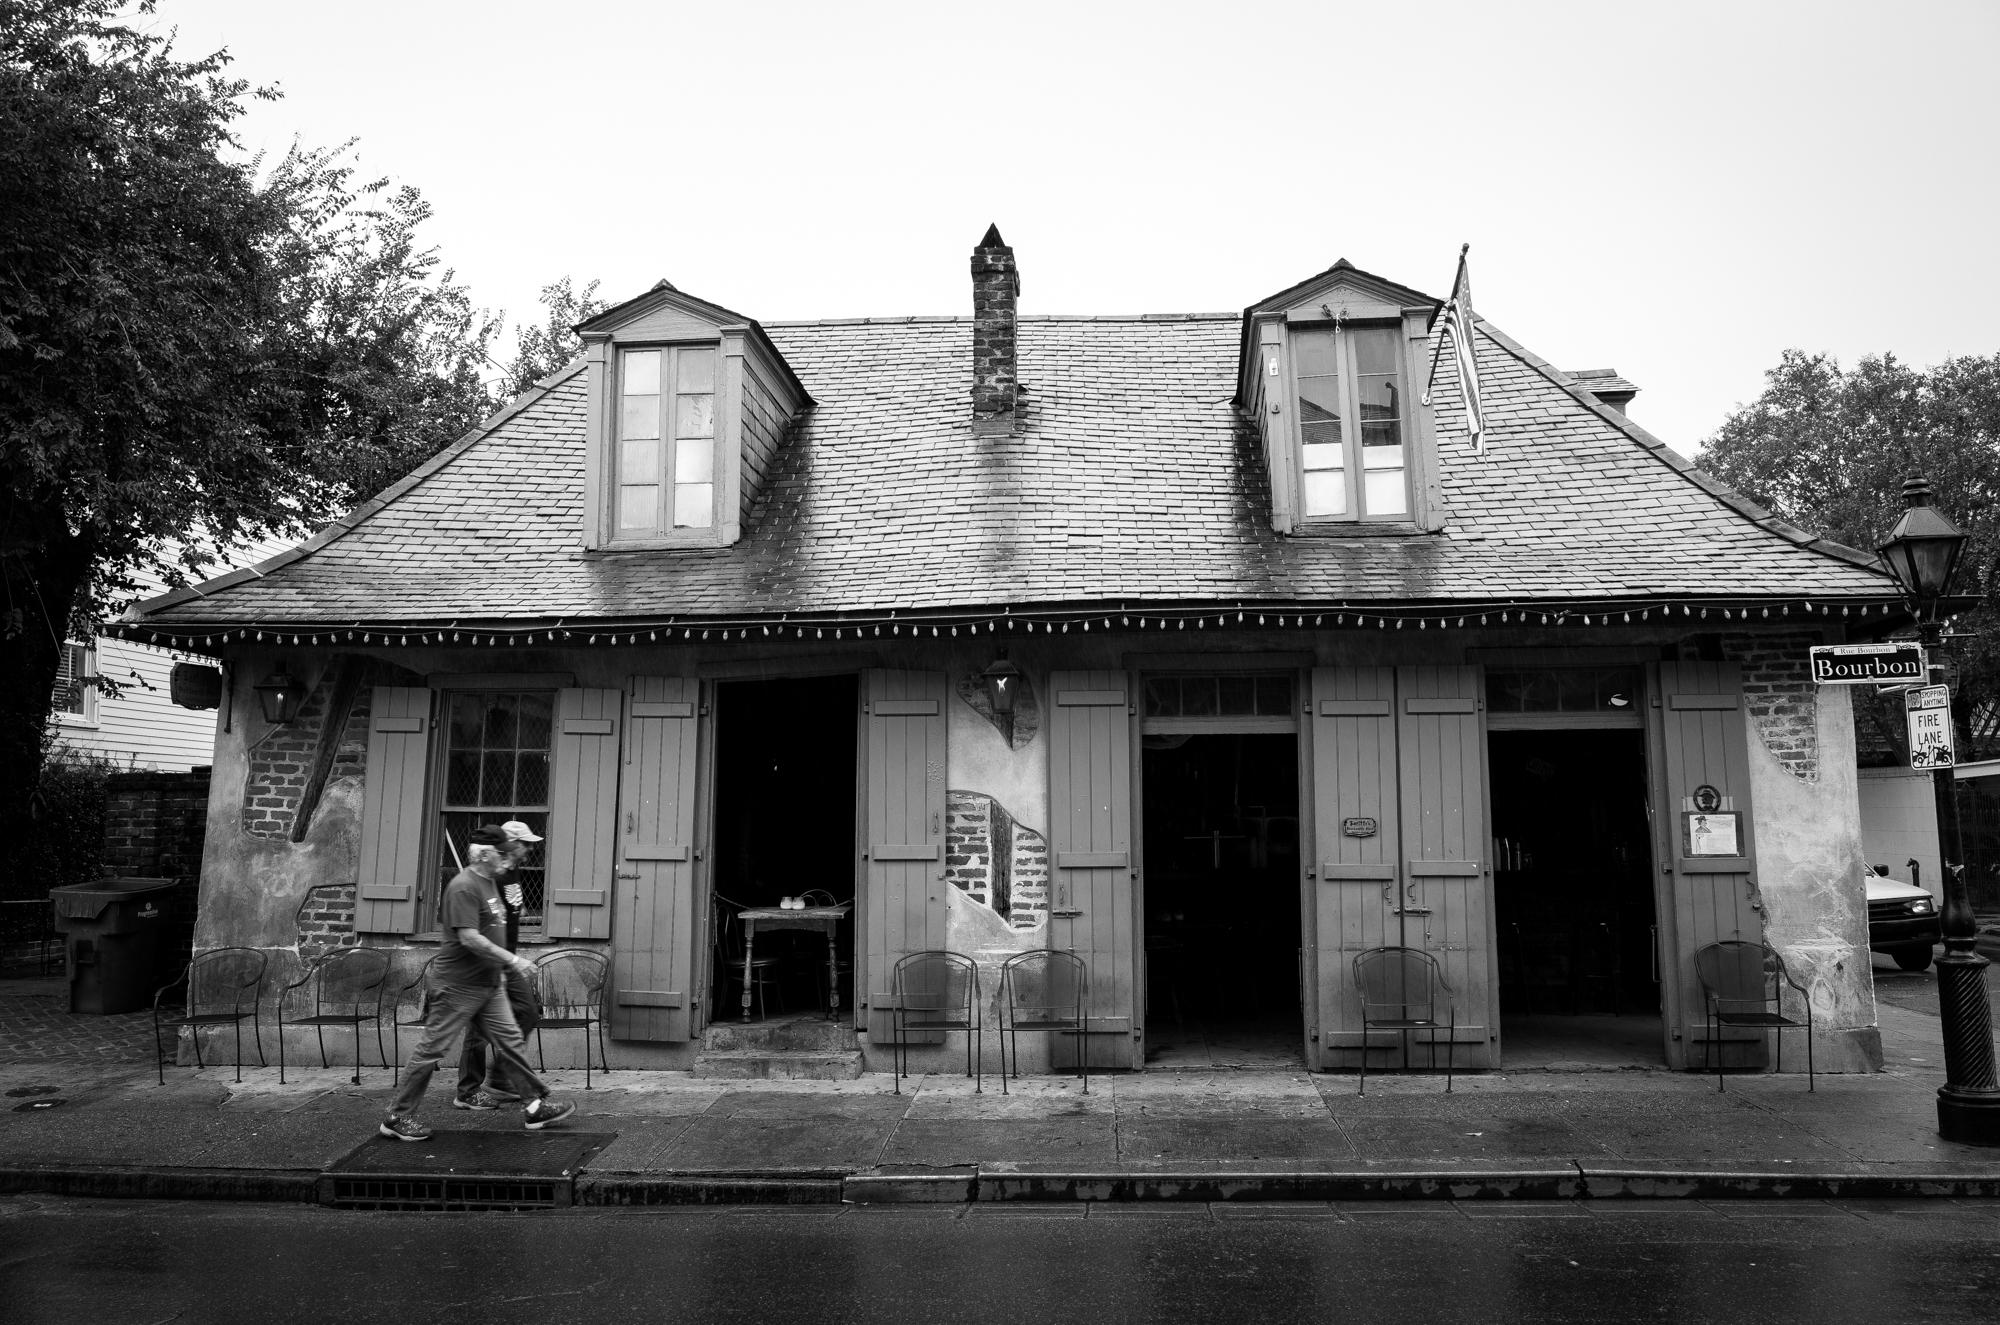 Lafitte's Blacksmith Bar